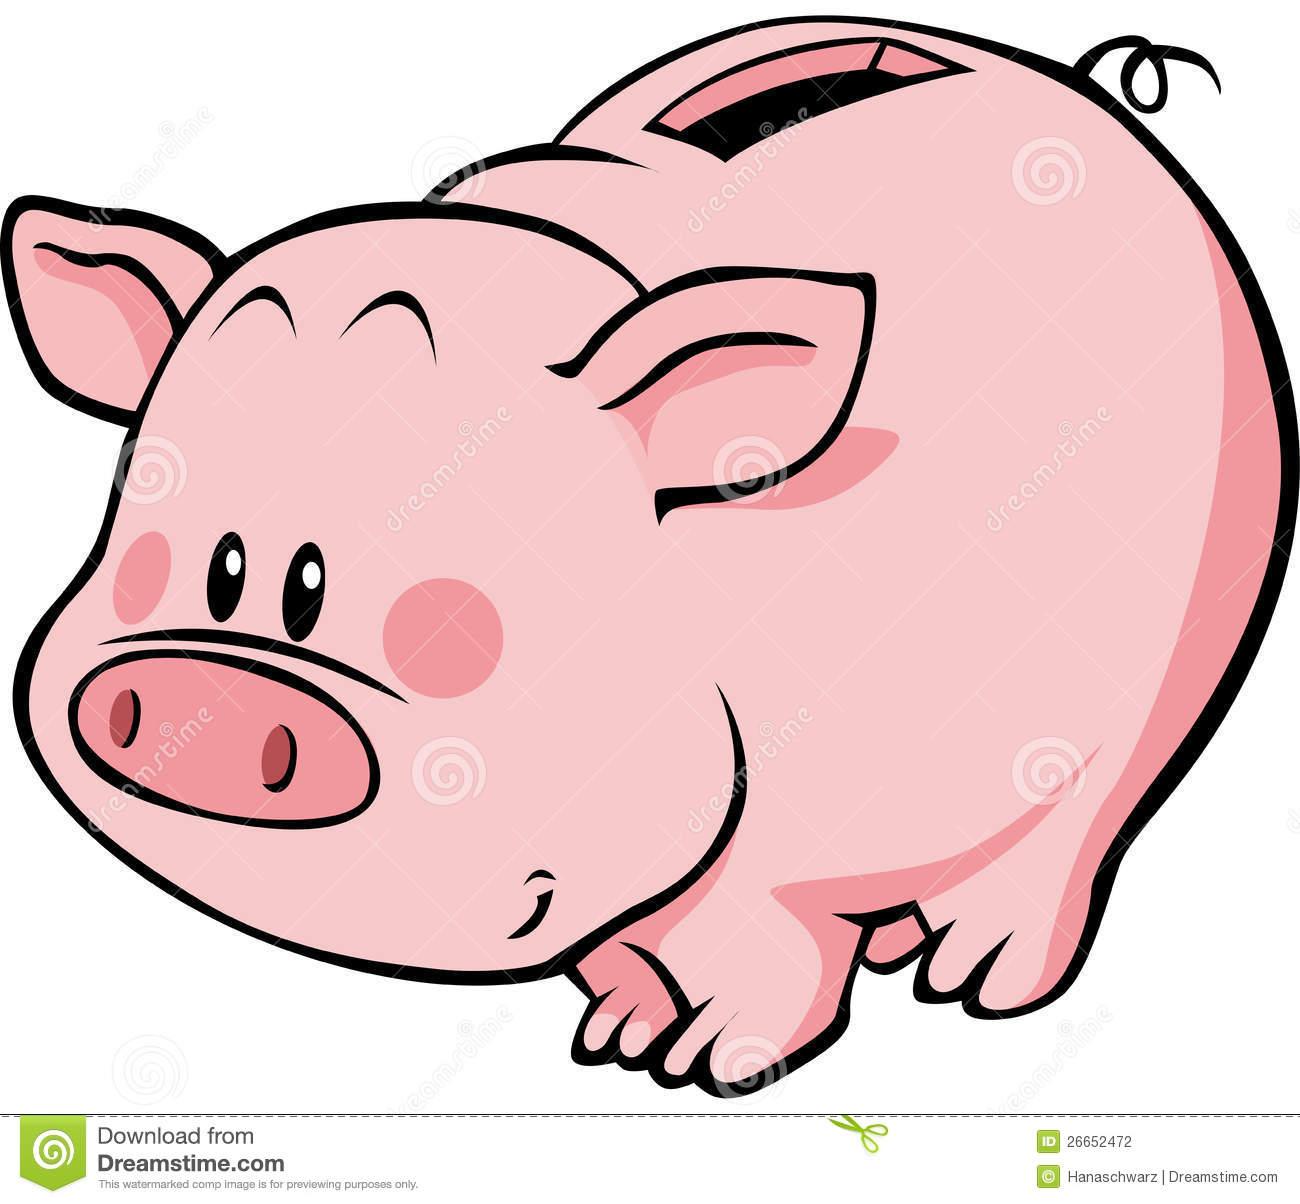 Piggy panda free images. Bank clipart cute